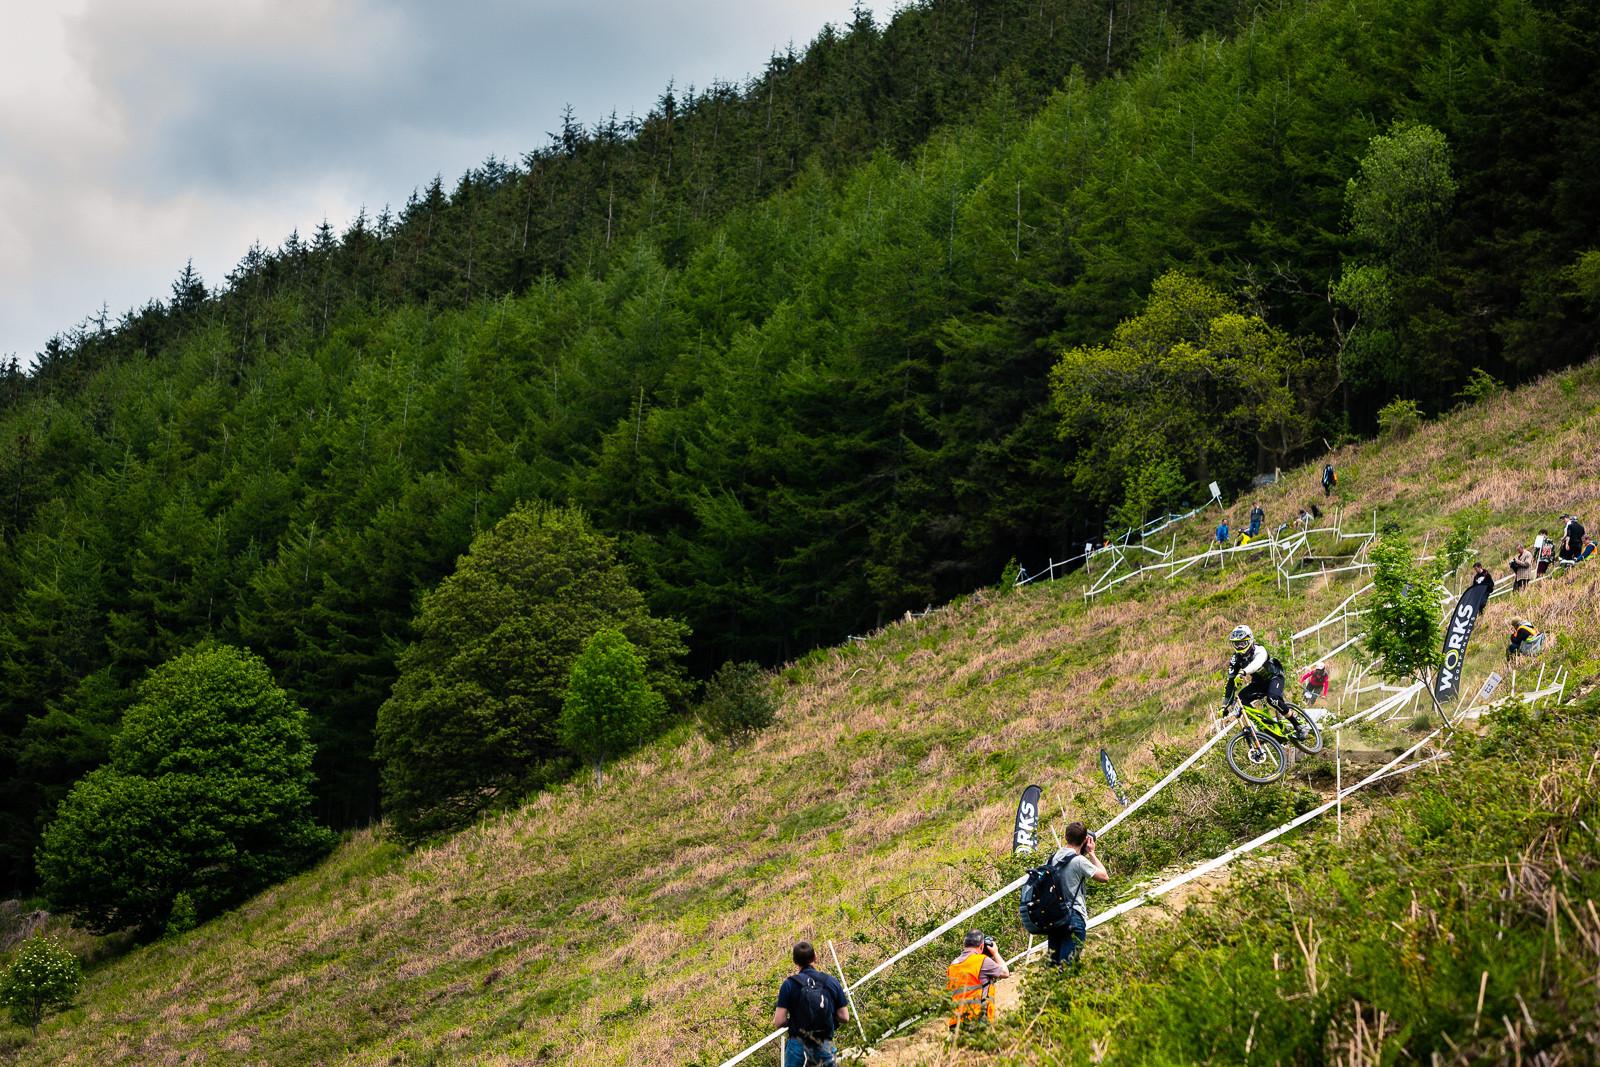 Bernard Kerr, British Downhill Series Langollen - RACE REPORT - British Downhill Series Llangollen - Mountain Biking Pictures - Vital MTB